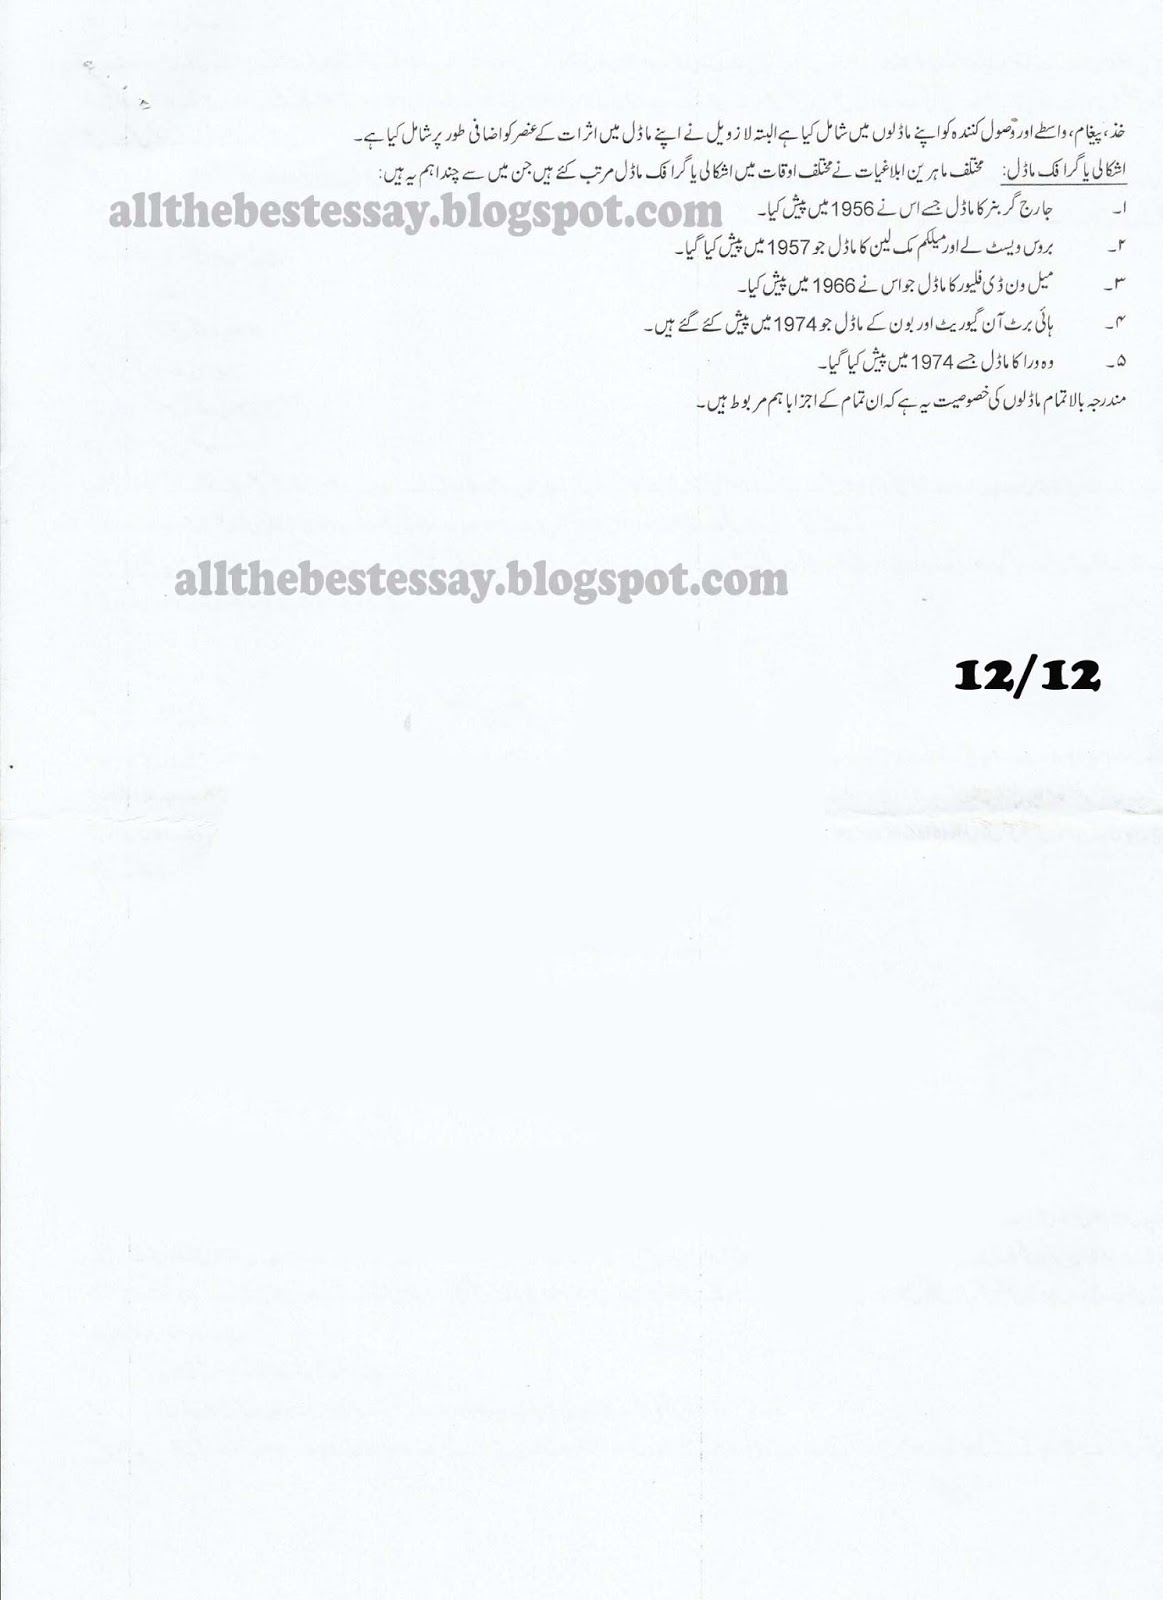 Jihad and terrorism essay in english